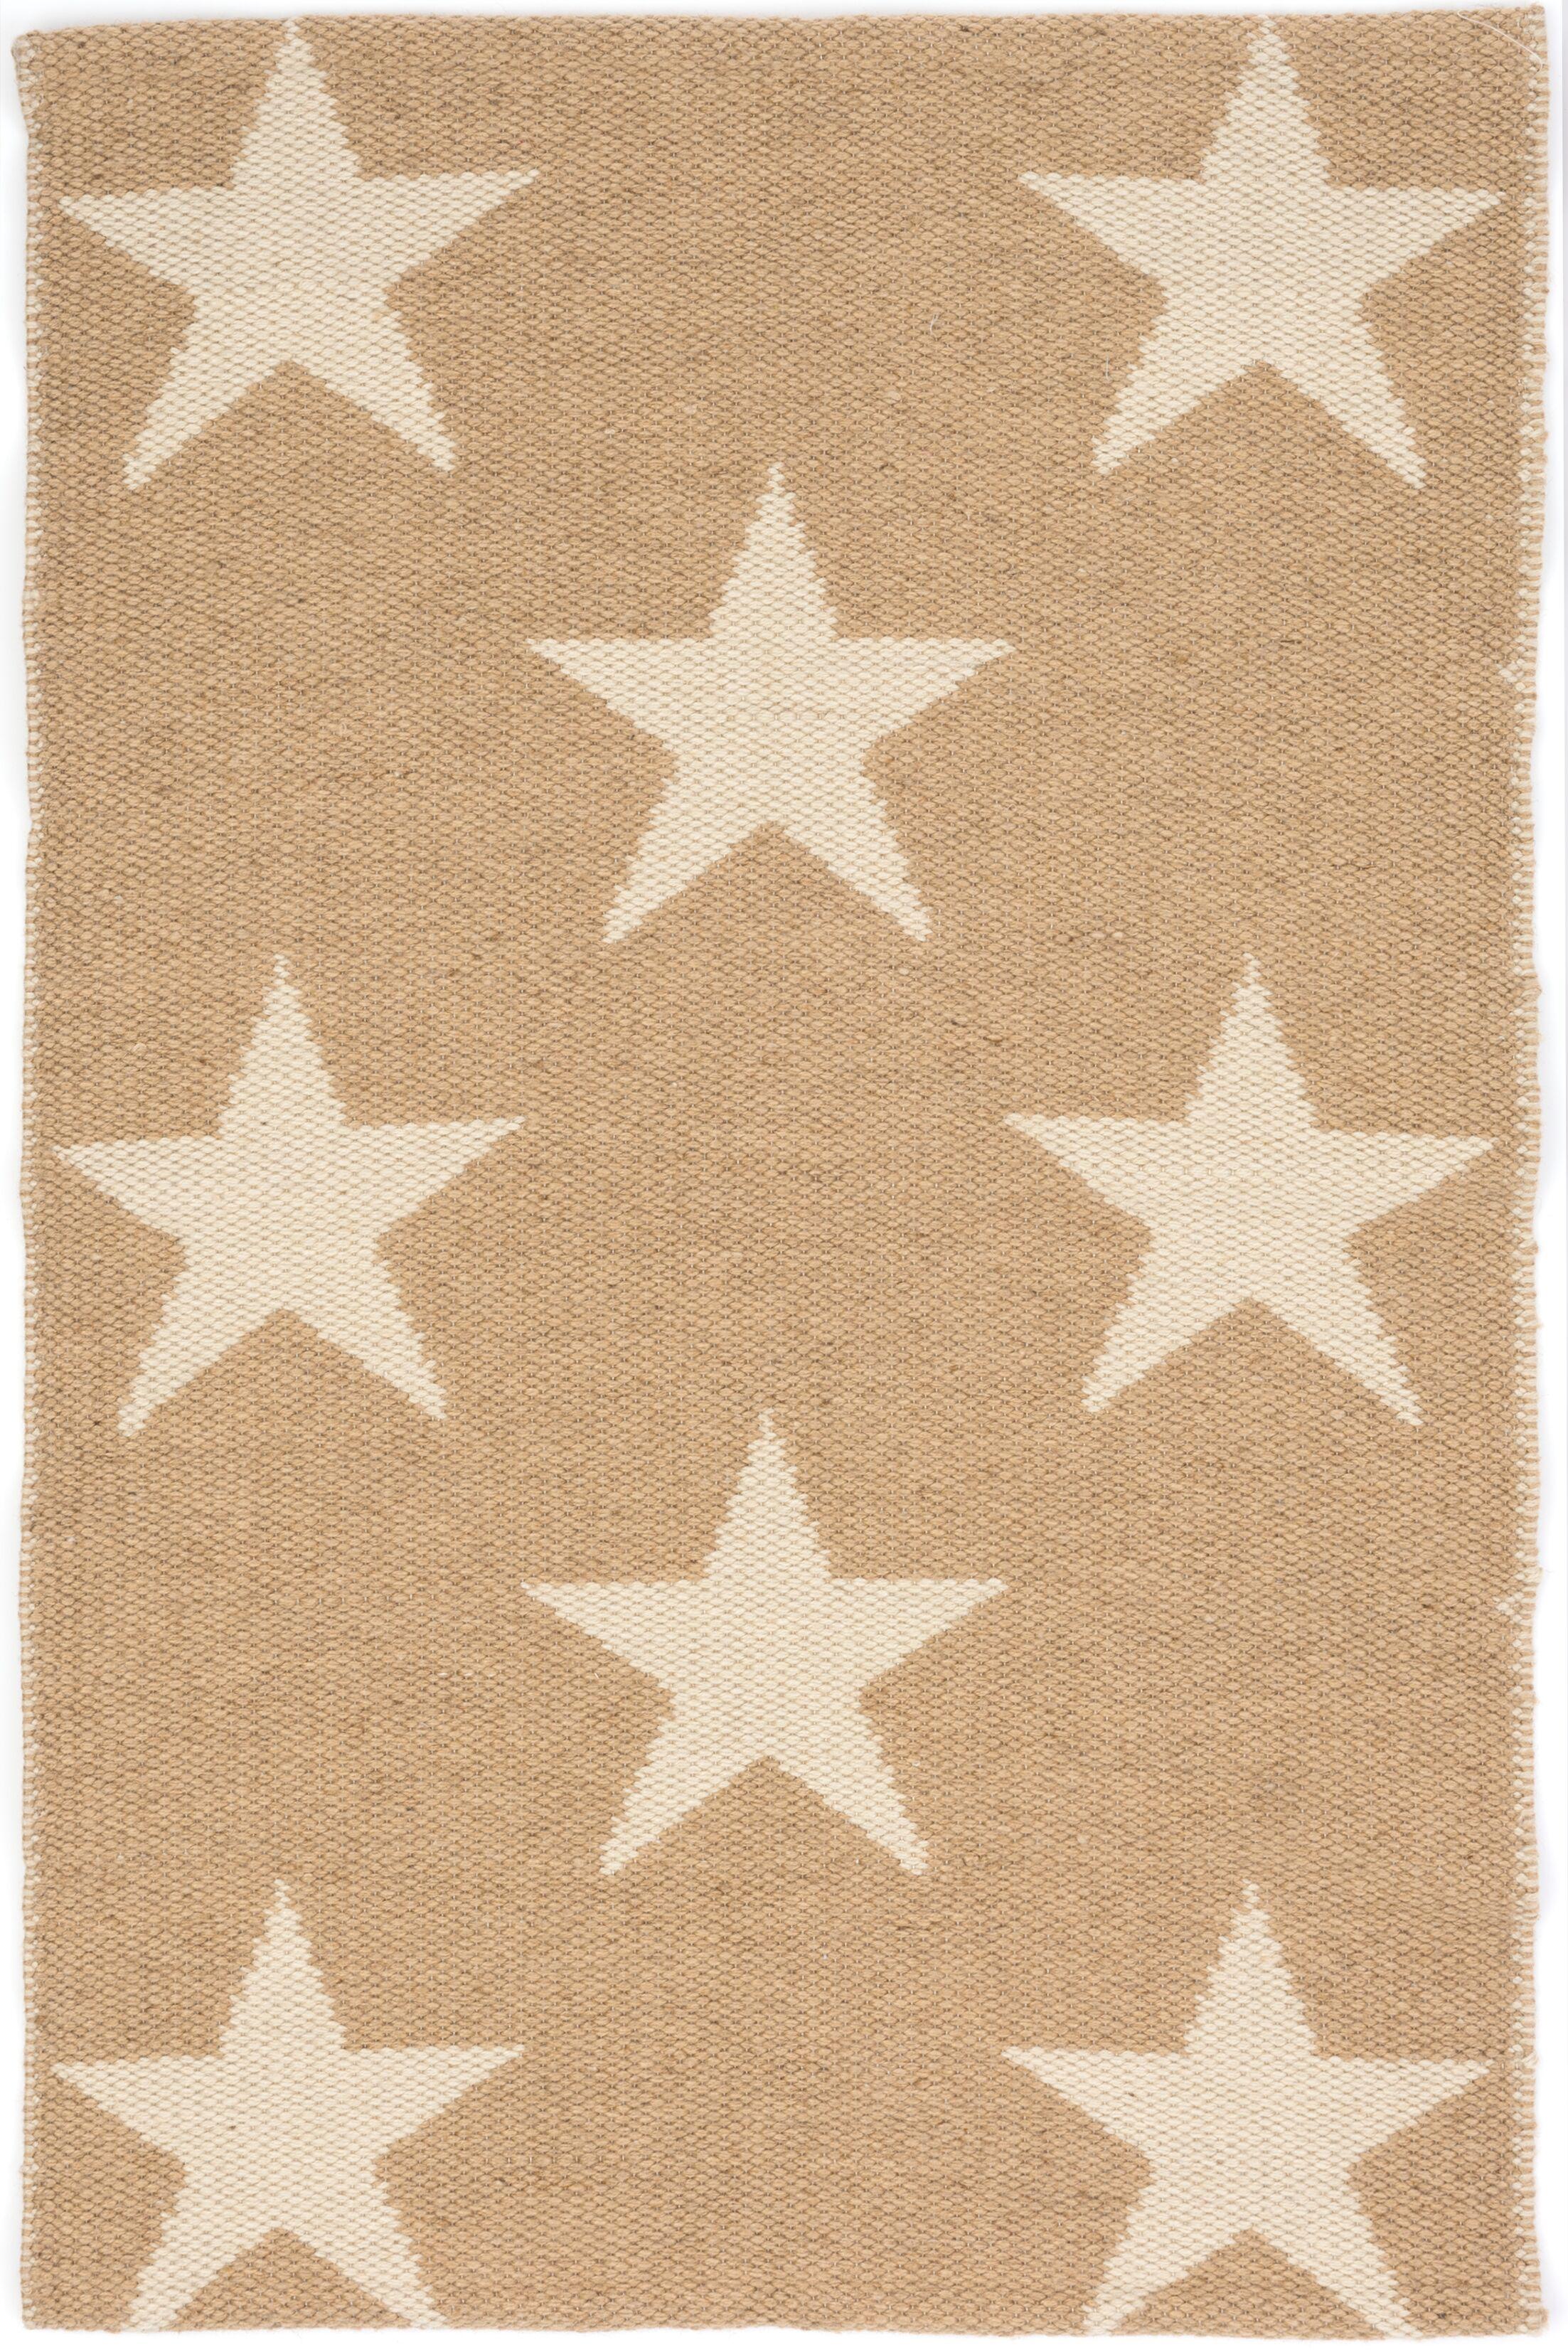 Star Hand Woven Beige/White Indoor/Outdoor Area Rug Rug Size: Rectangle 8' x 10'